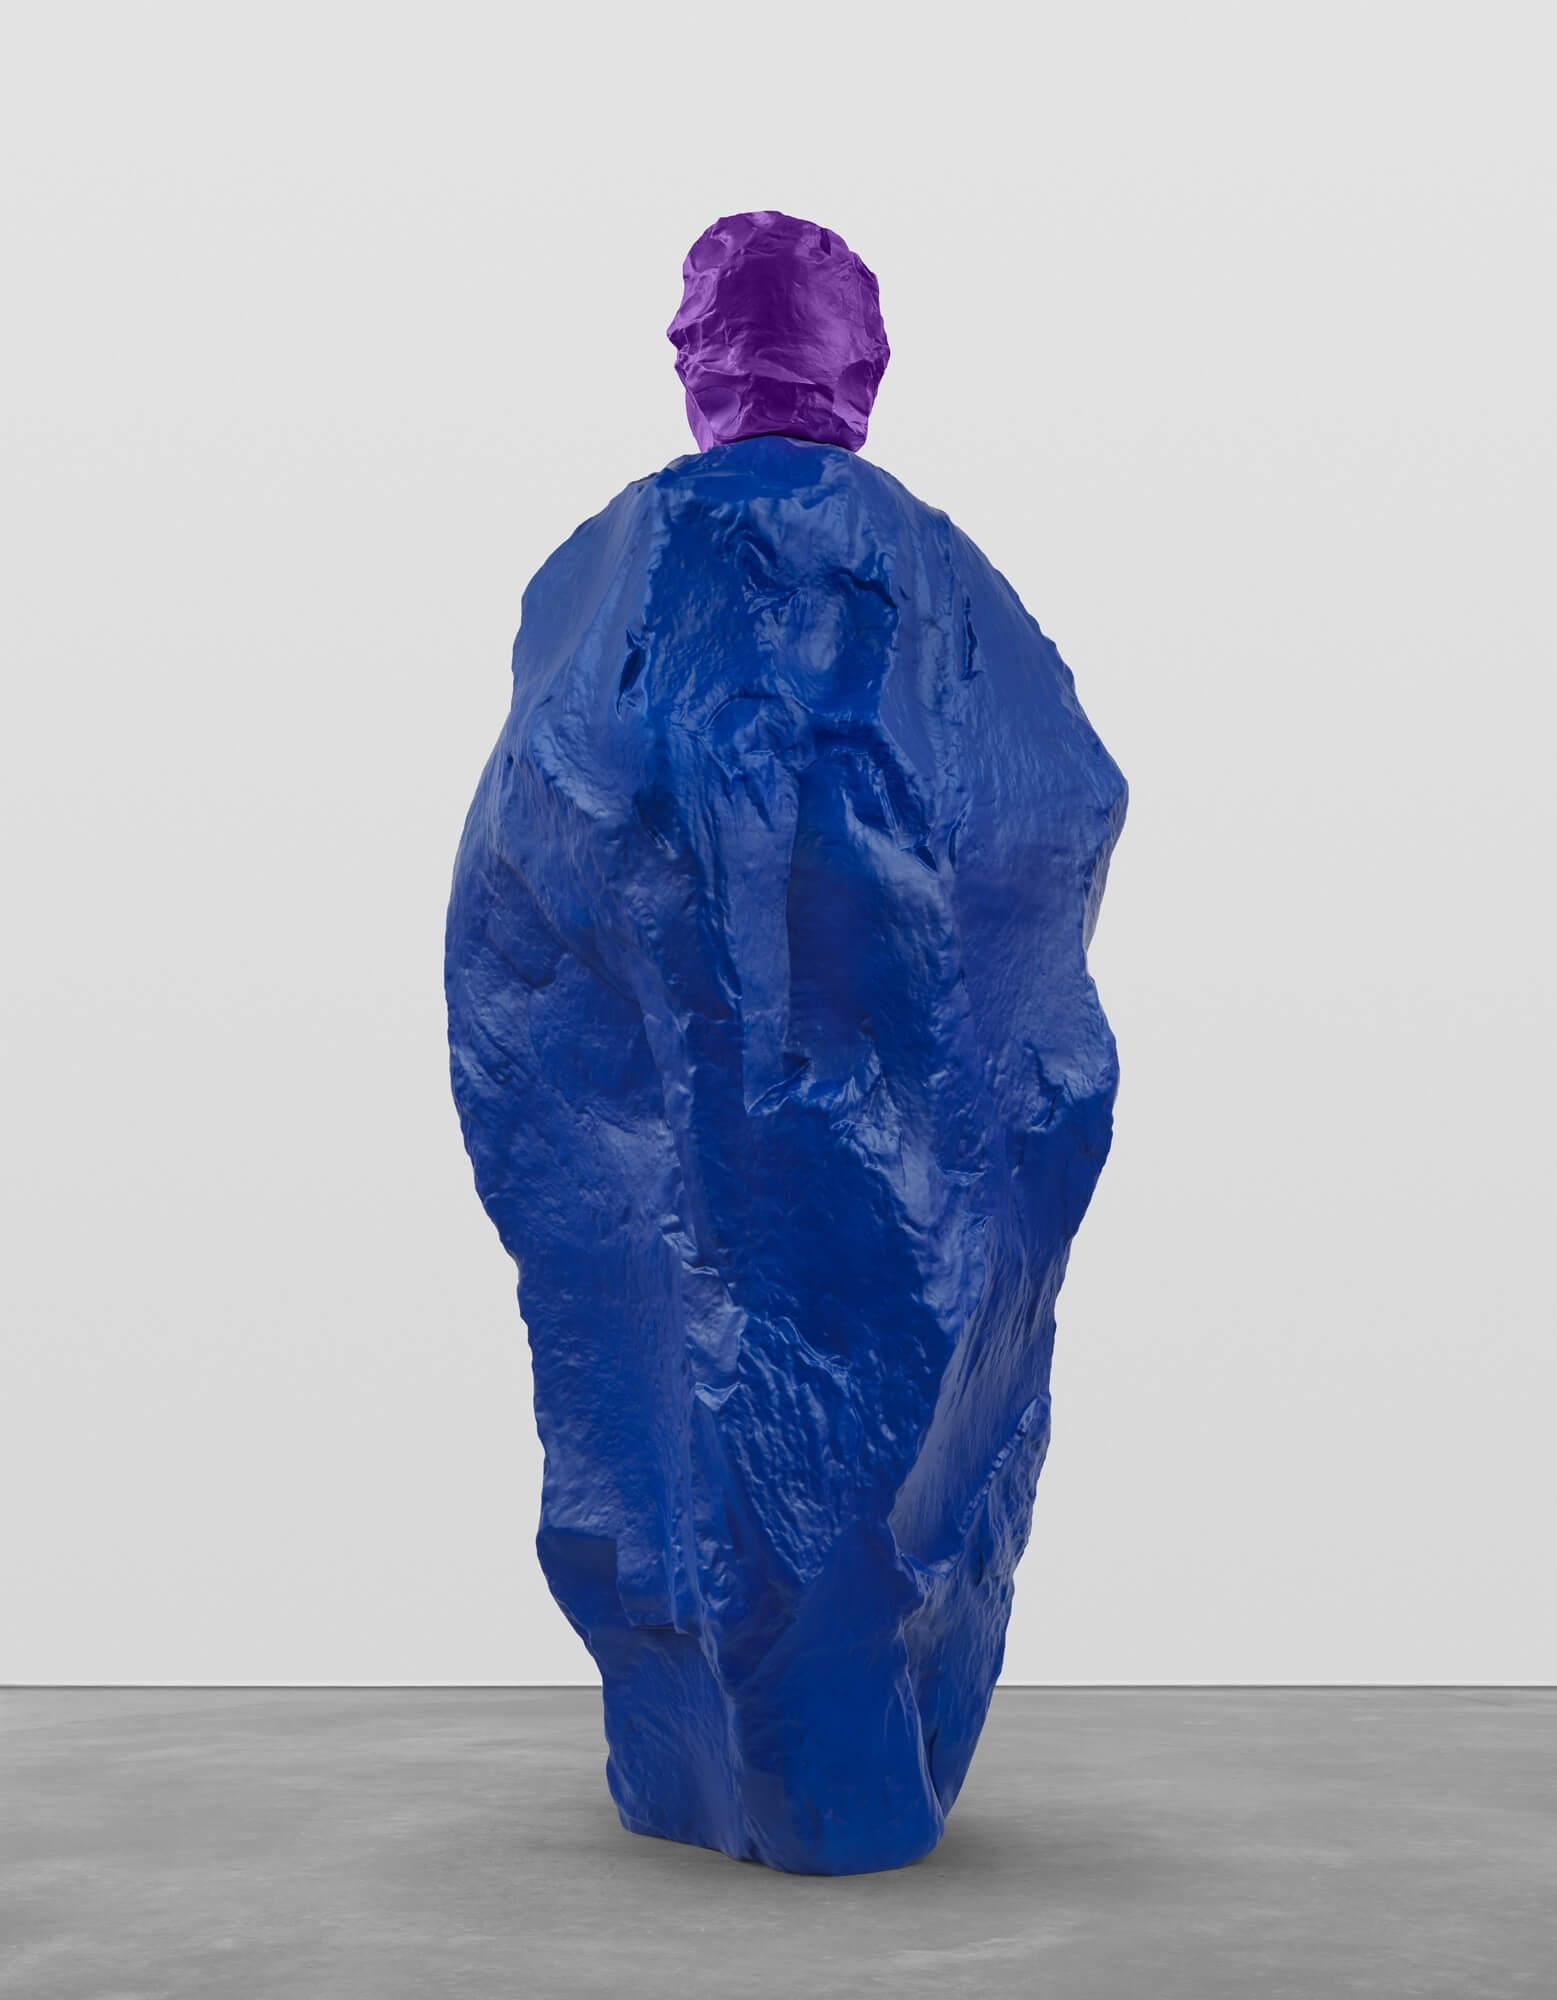 violet blue nun   UGO RONDINONE